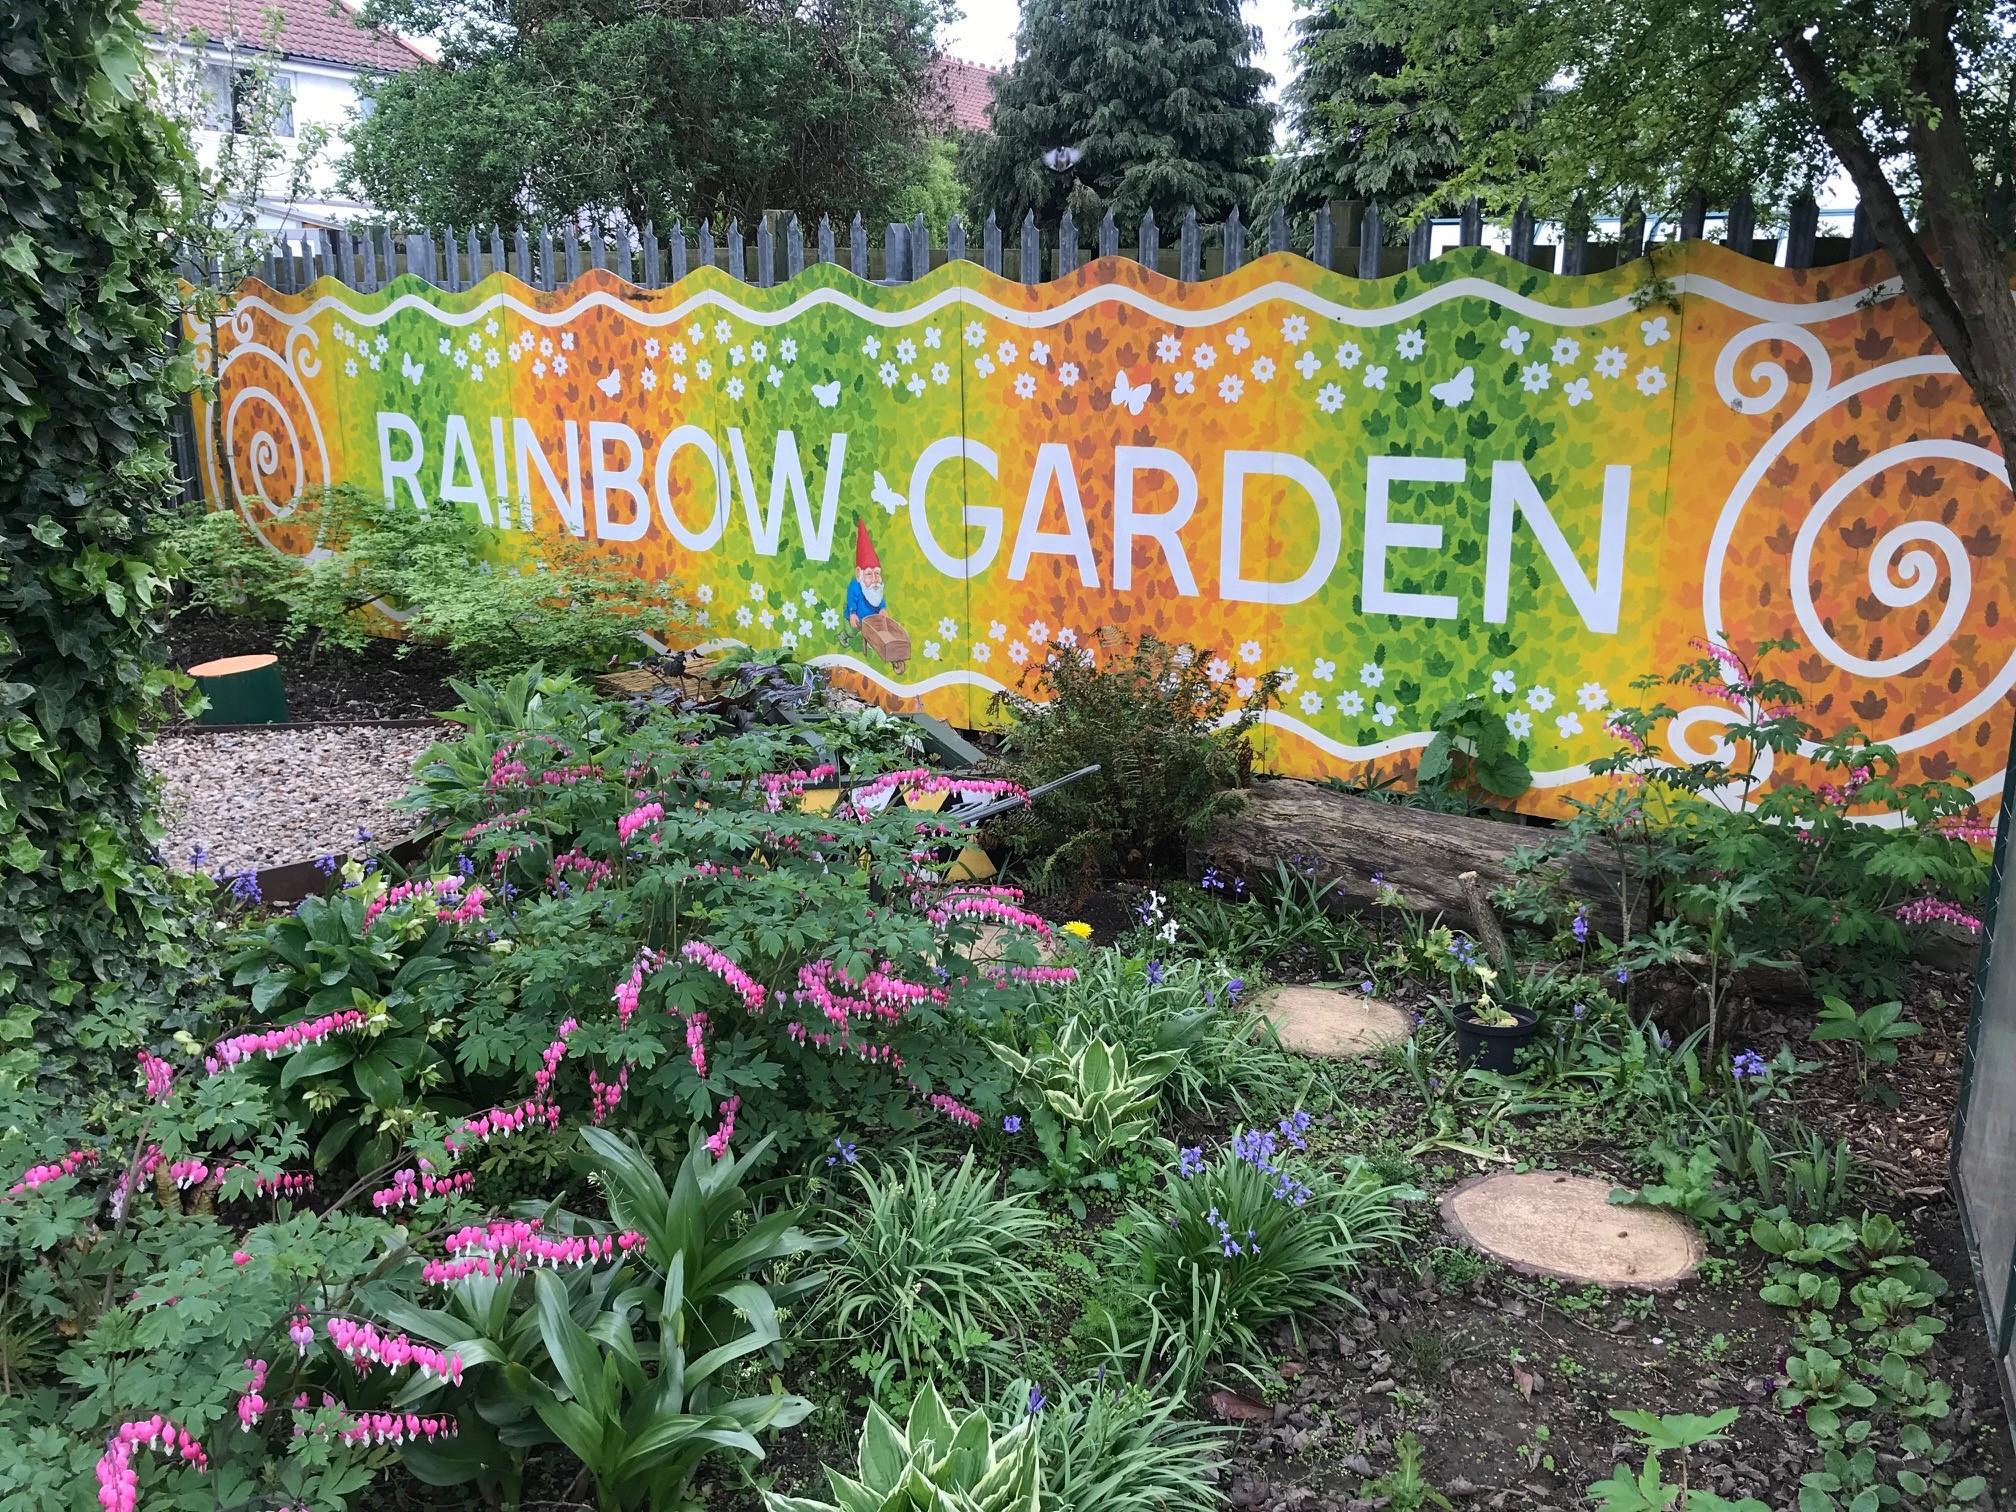 The secret rainbow garden.